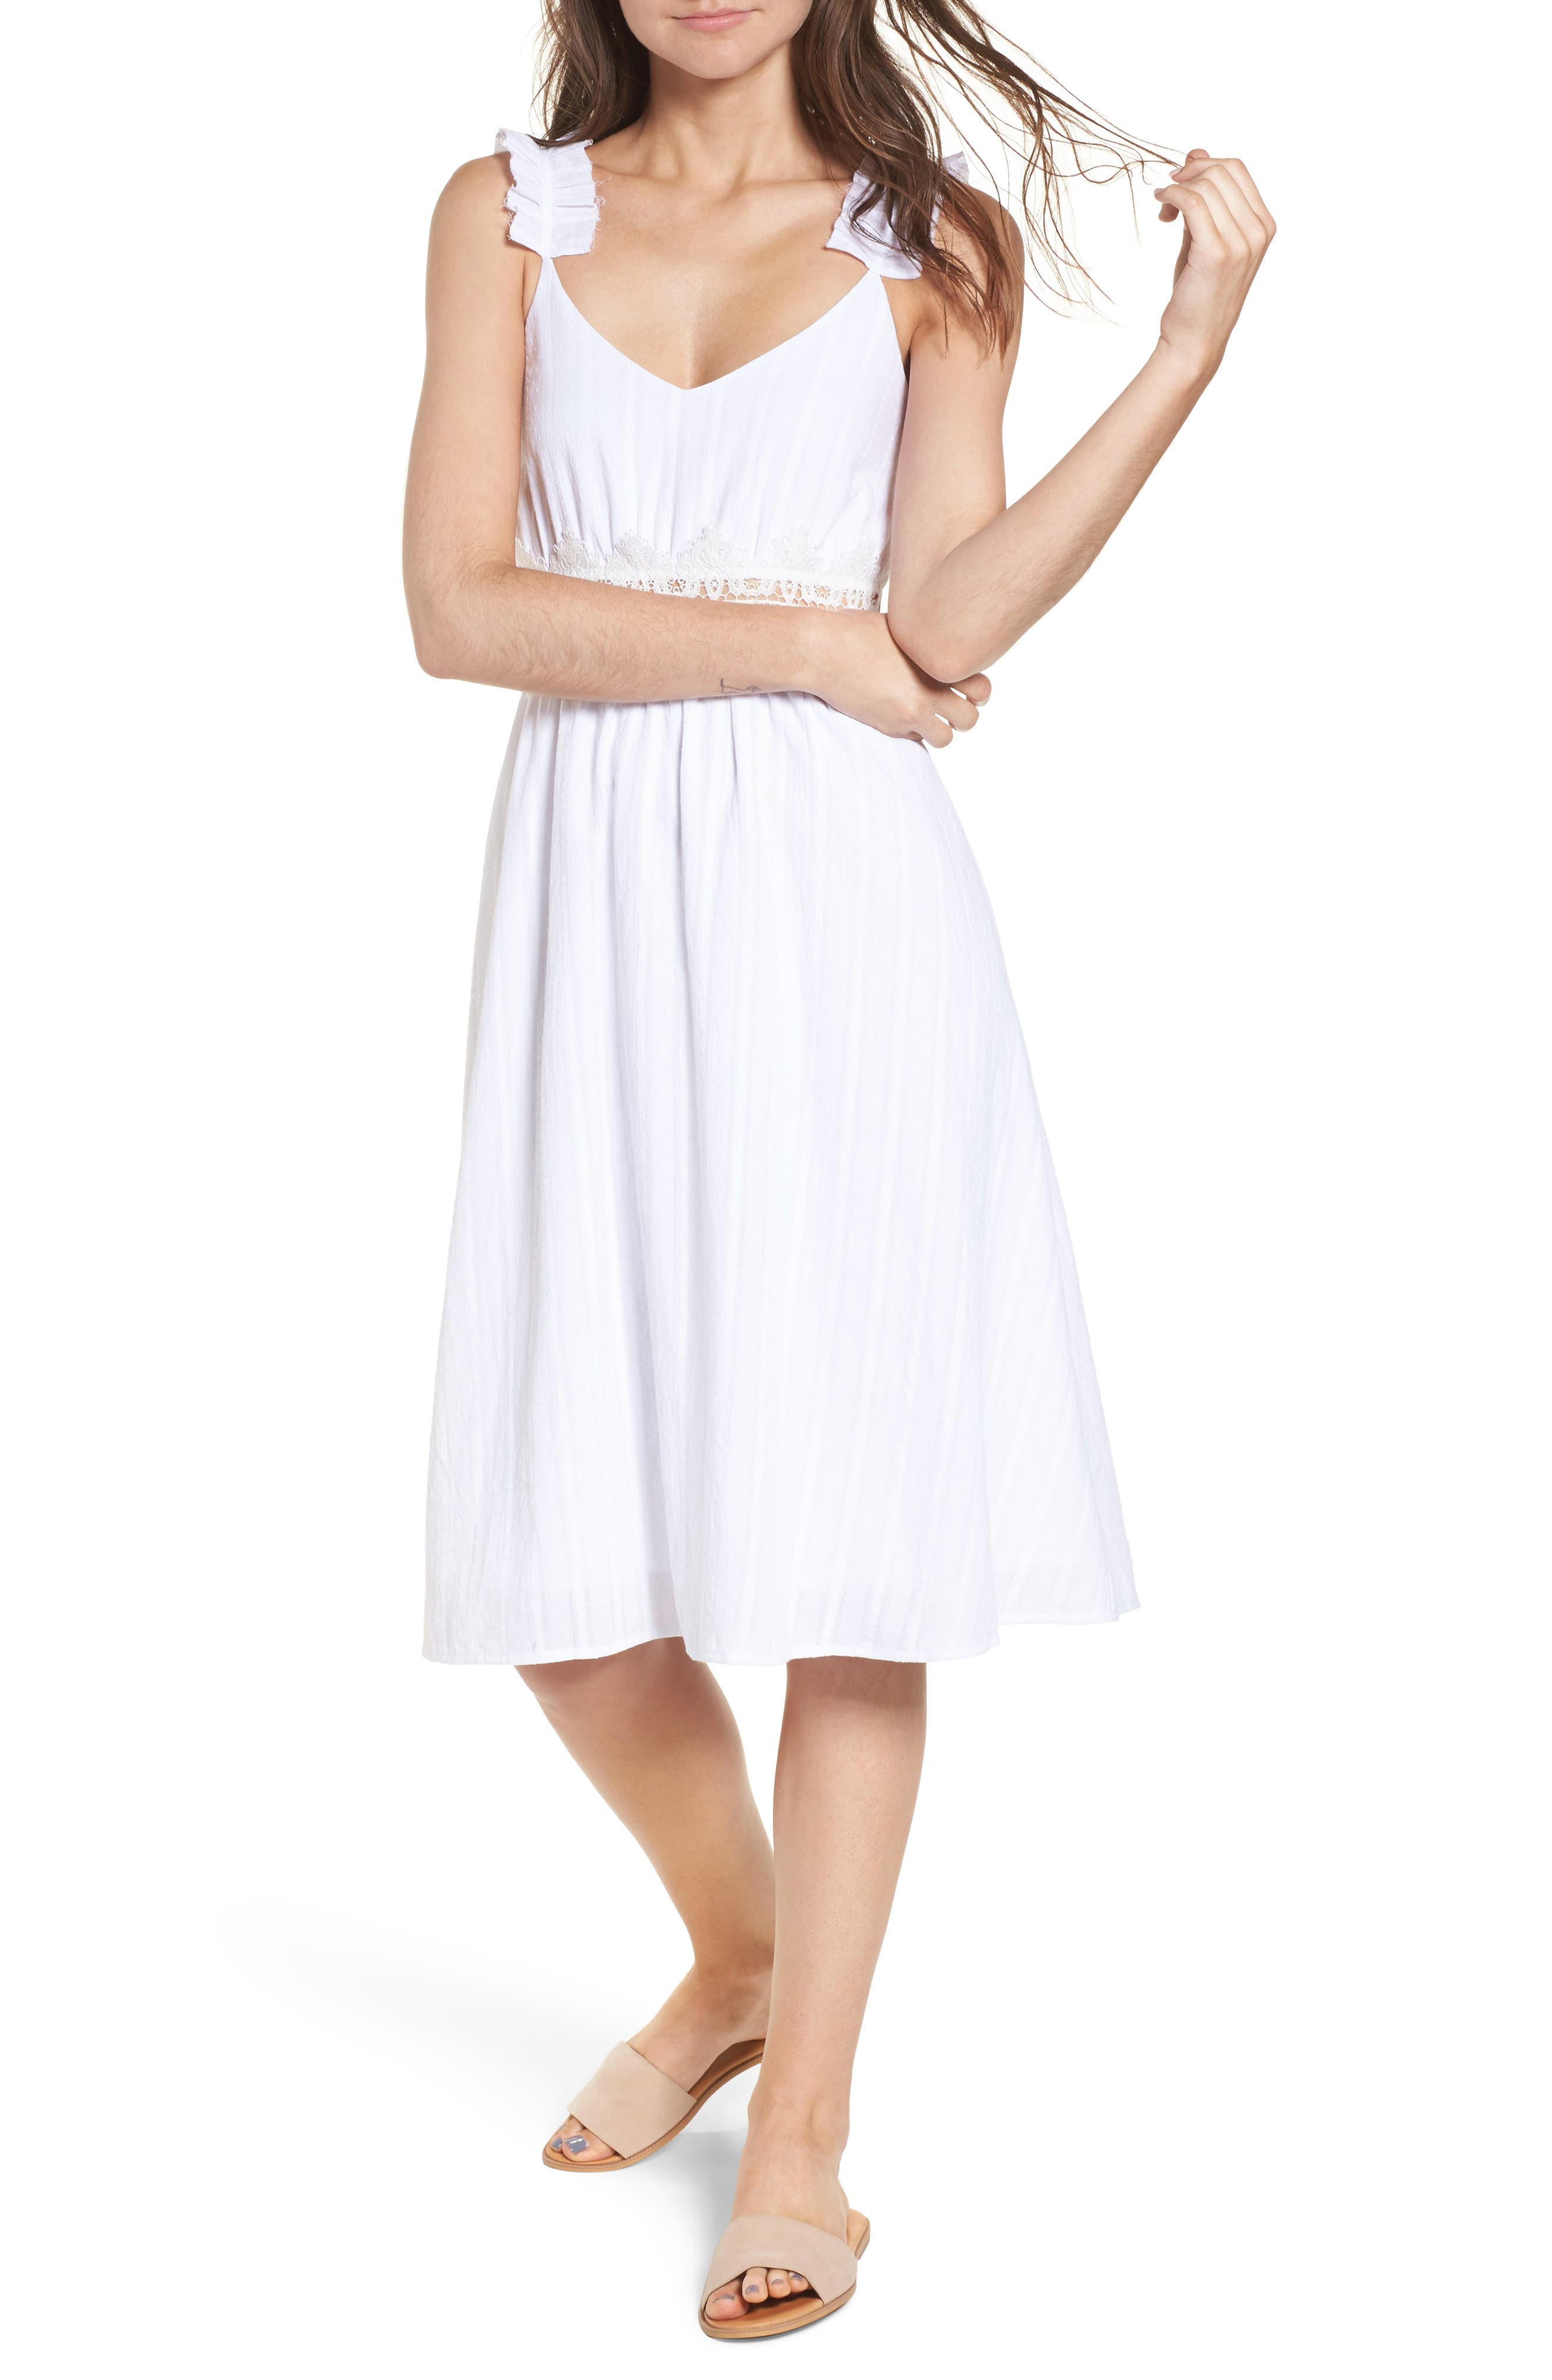 Main Image - Moon River Lace Inset Cotton Dress